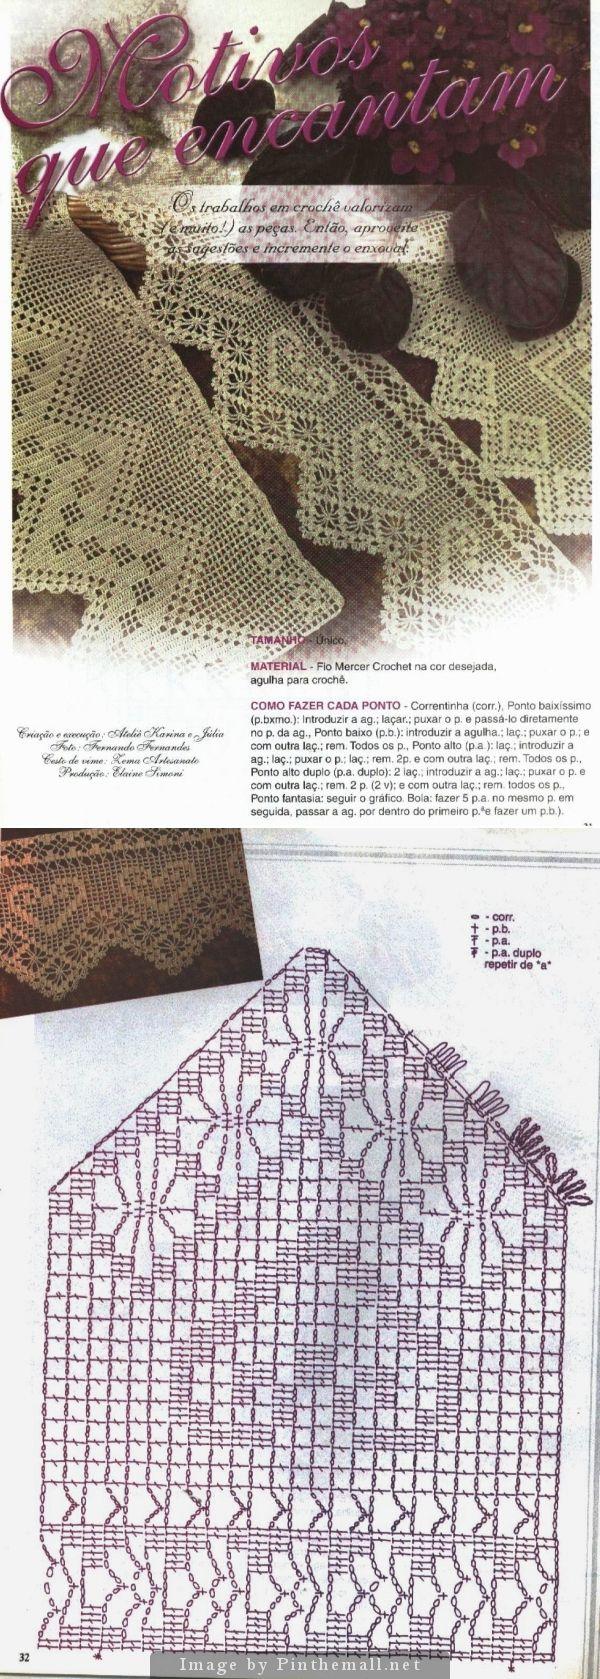 Filet crochet lace edging with interlaced diamond on straight edge, heart & spider points ~~ http://crocheartemanuais.blogspot.com/2013/12/barradinhos_7447.html